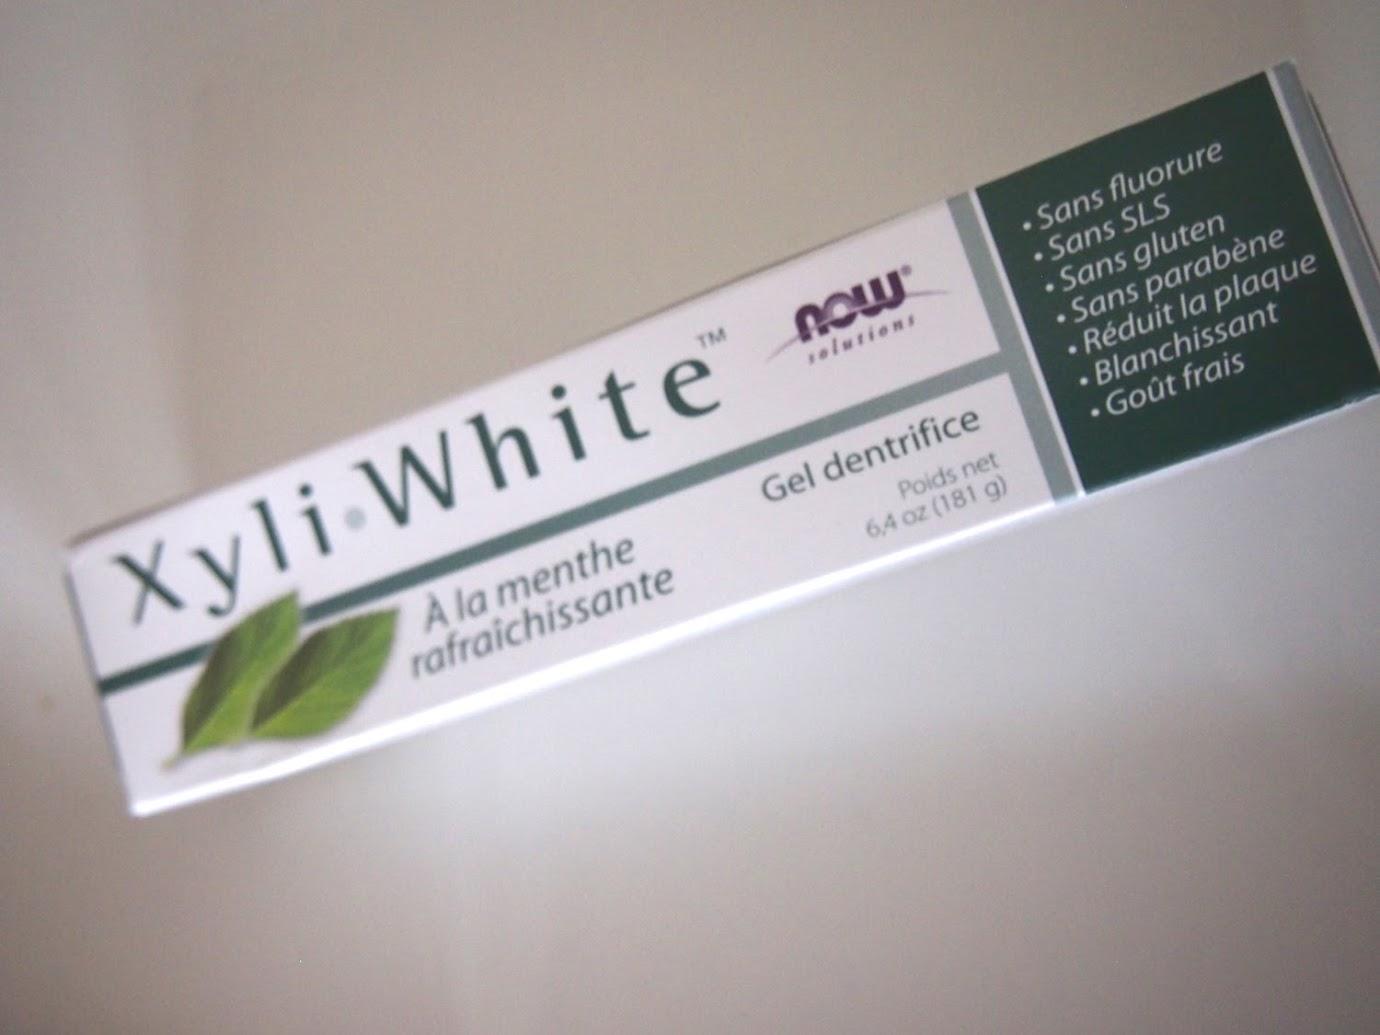 Now Foods, ソリューション、Xyli−White(エキシリルホワイト)歯磨きジェル、リフレッシュミント、6.4 oz (181 g)